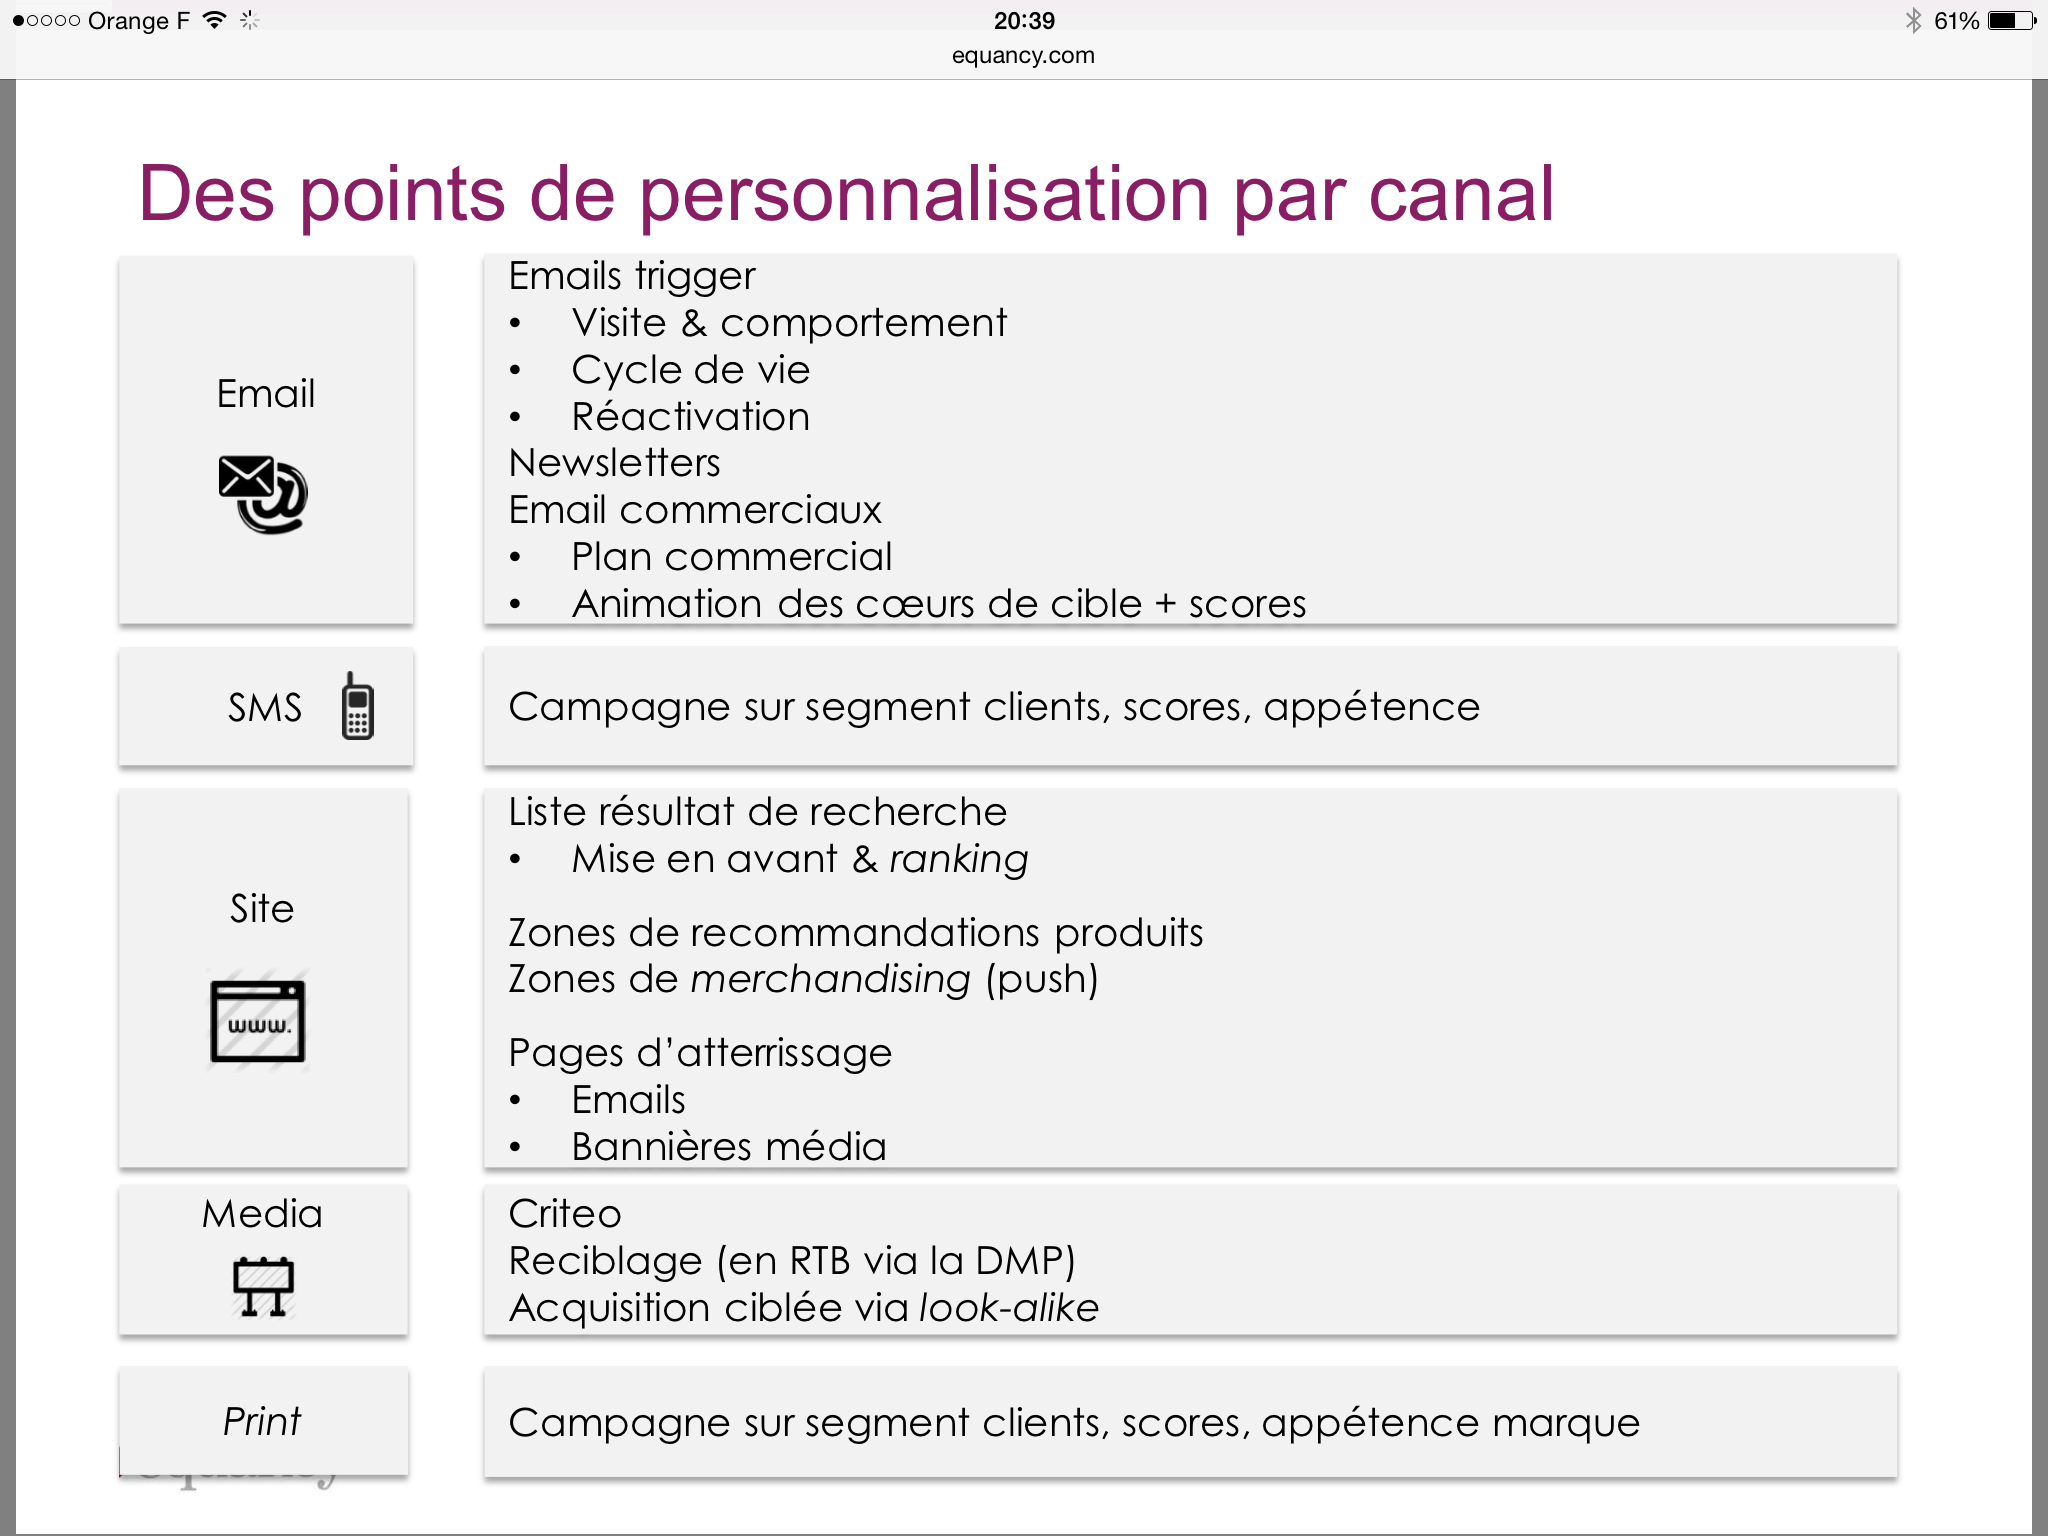 PersonnalisationBigData-2-Yann